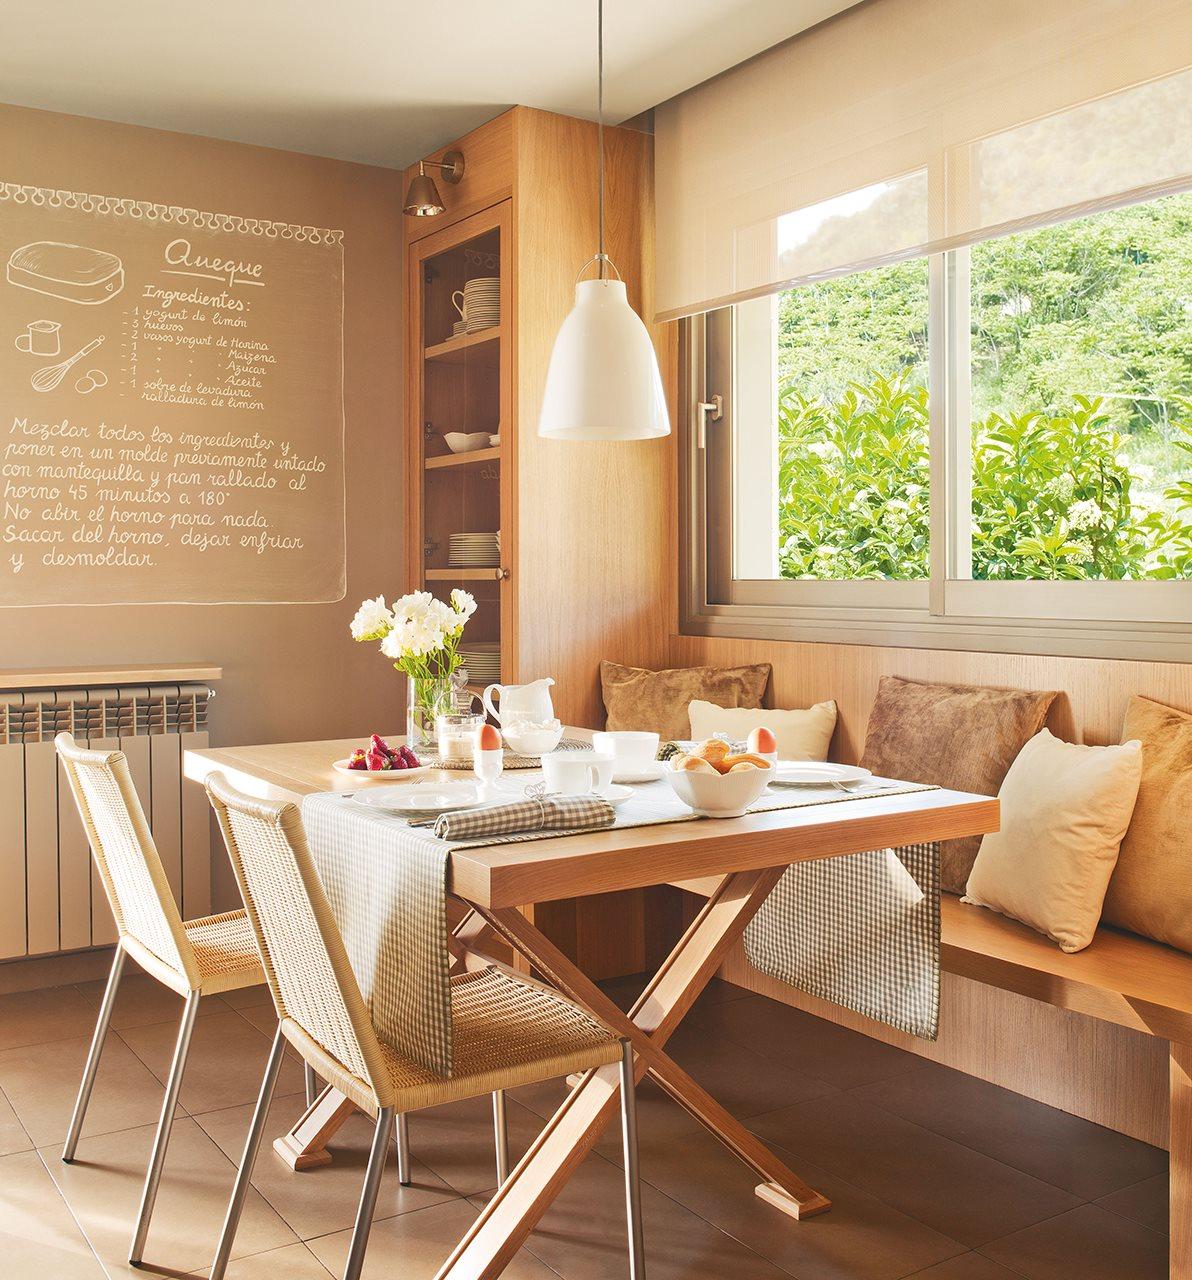 Los 9 mejores dise os de cocinas office for Mesas de cocina con banco